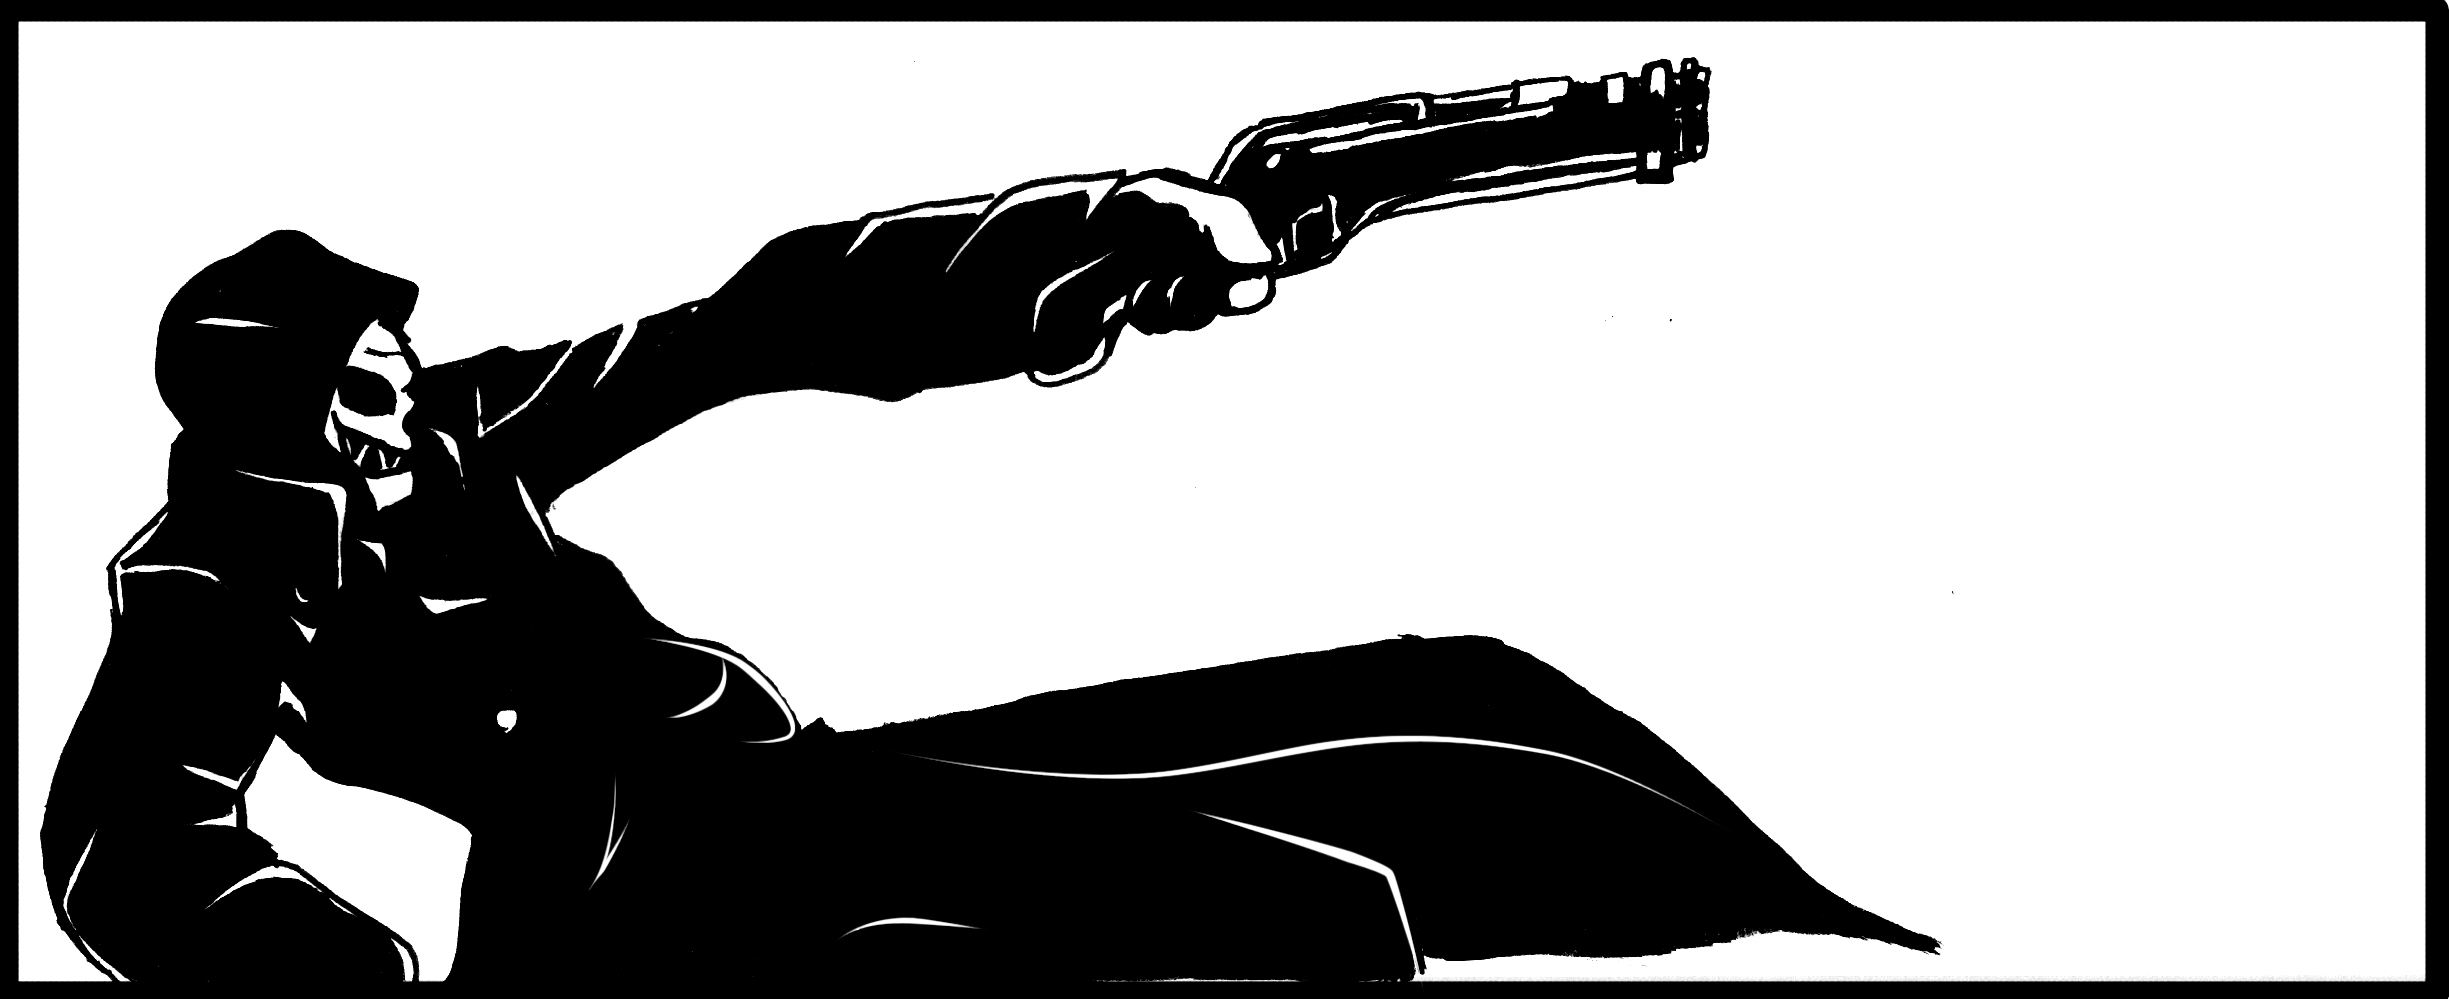 Corvo attano Dishonored (Ink) by linktsubasa